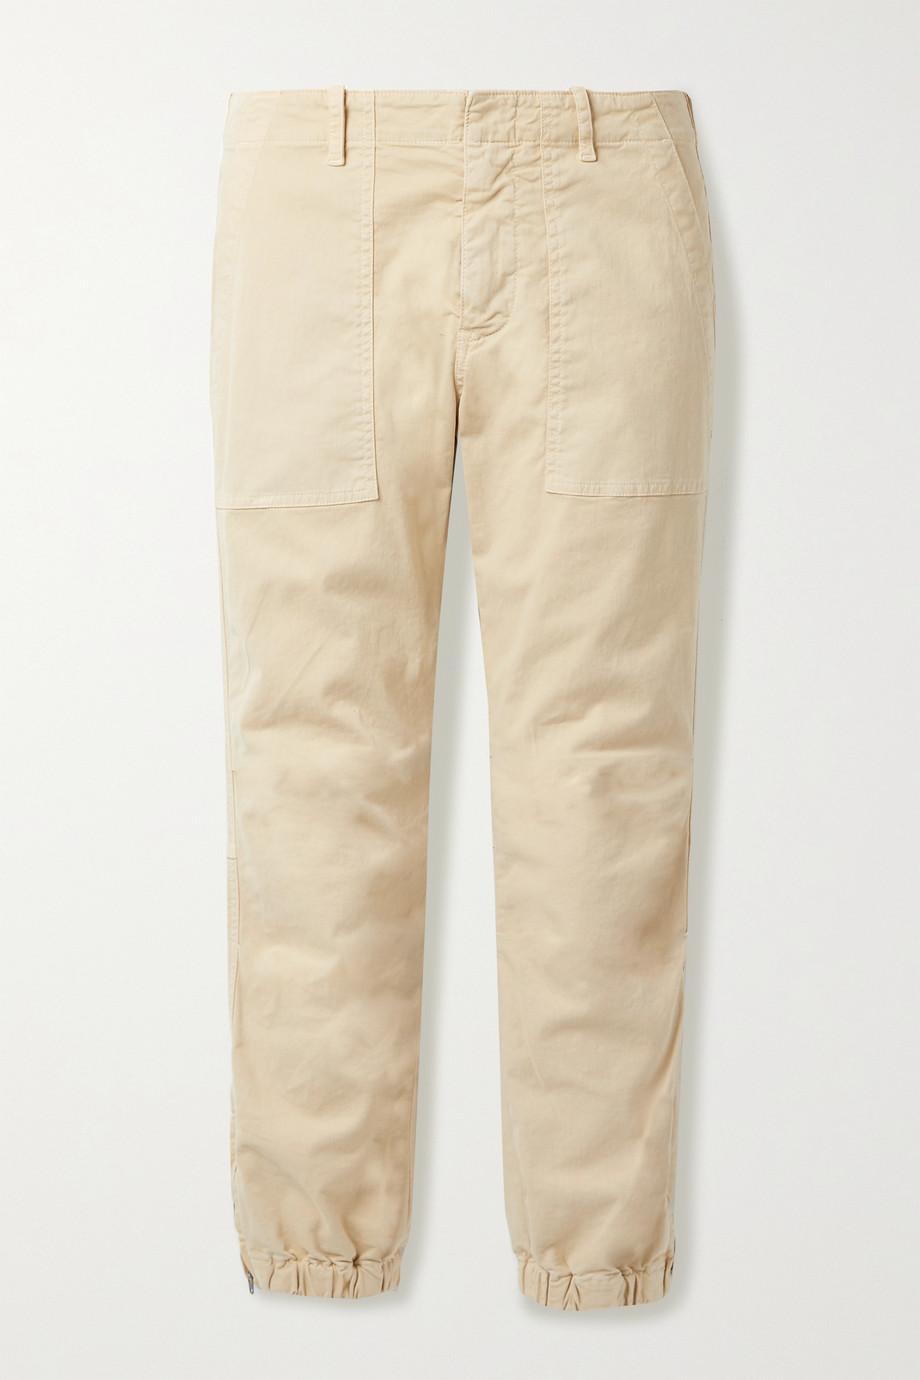 Nili Lotan Cropped cotton-blend twill tapered pants